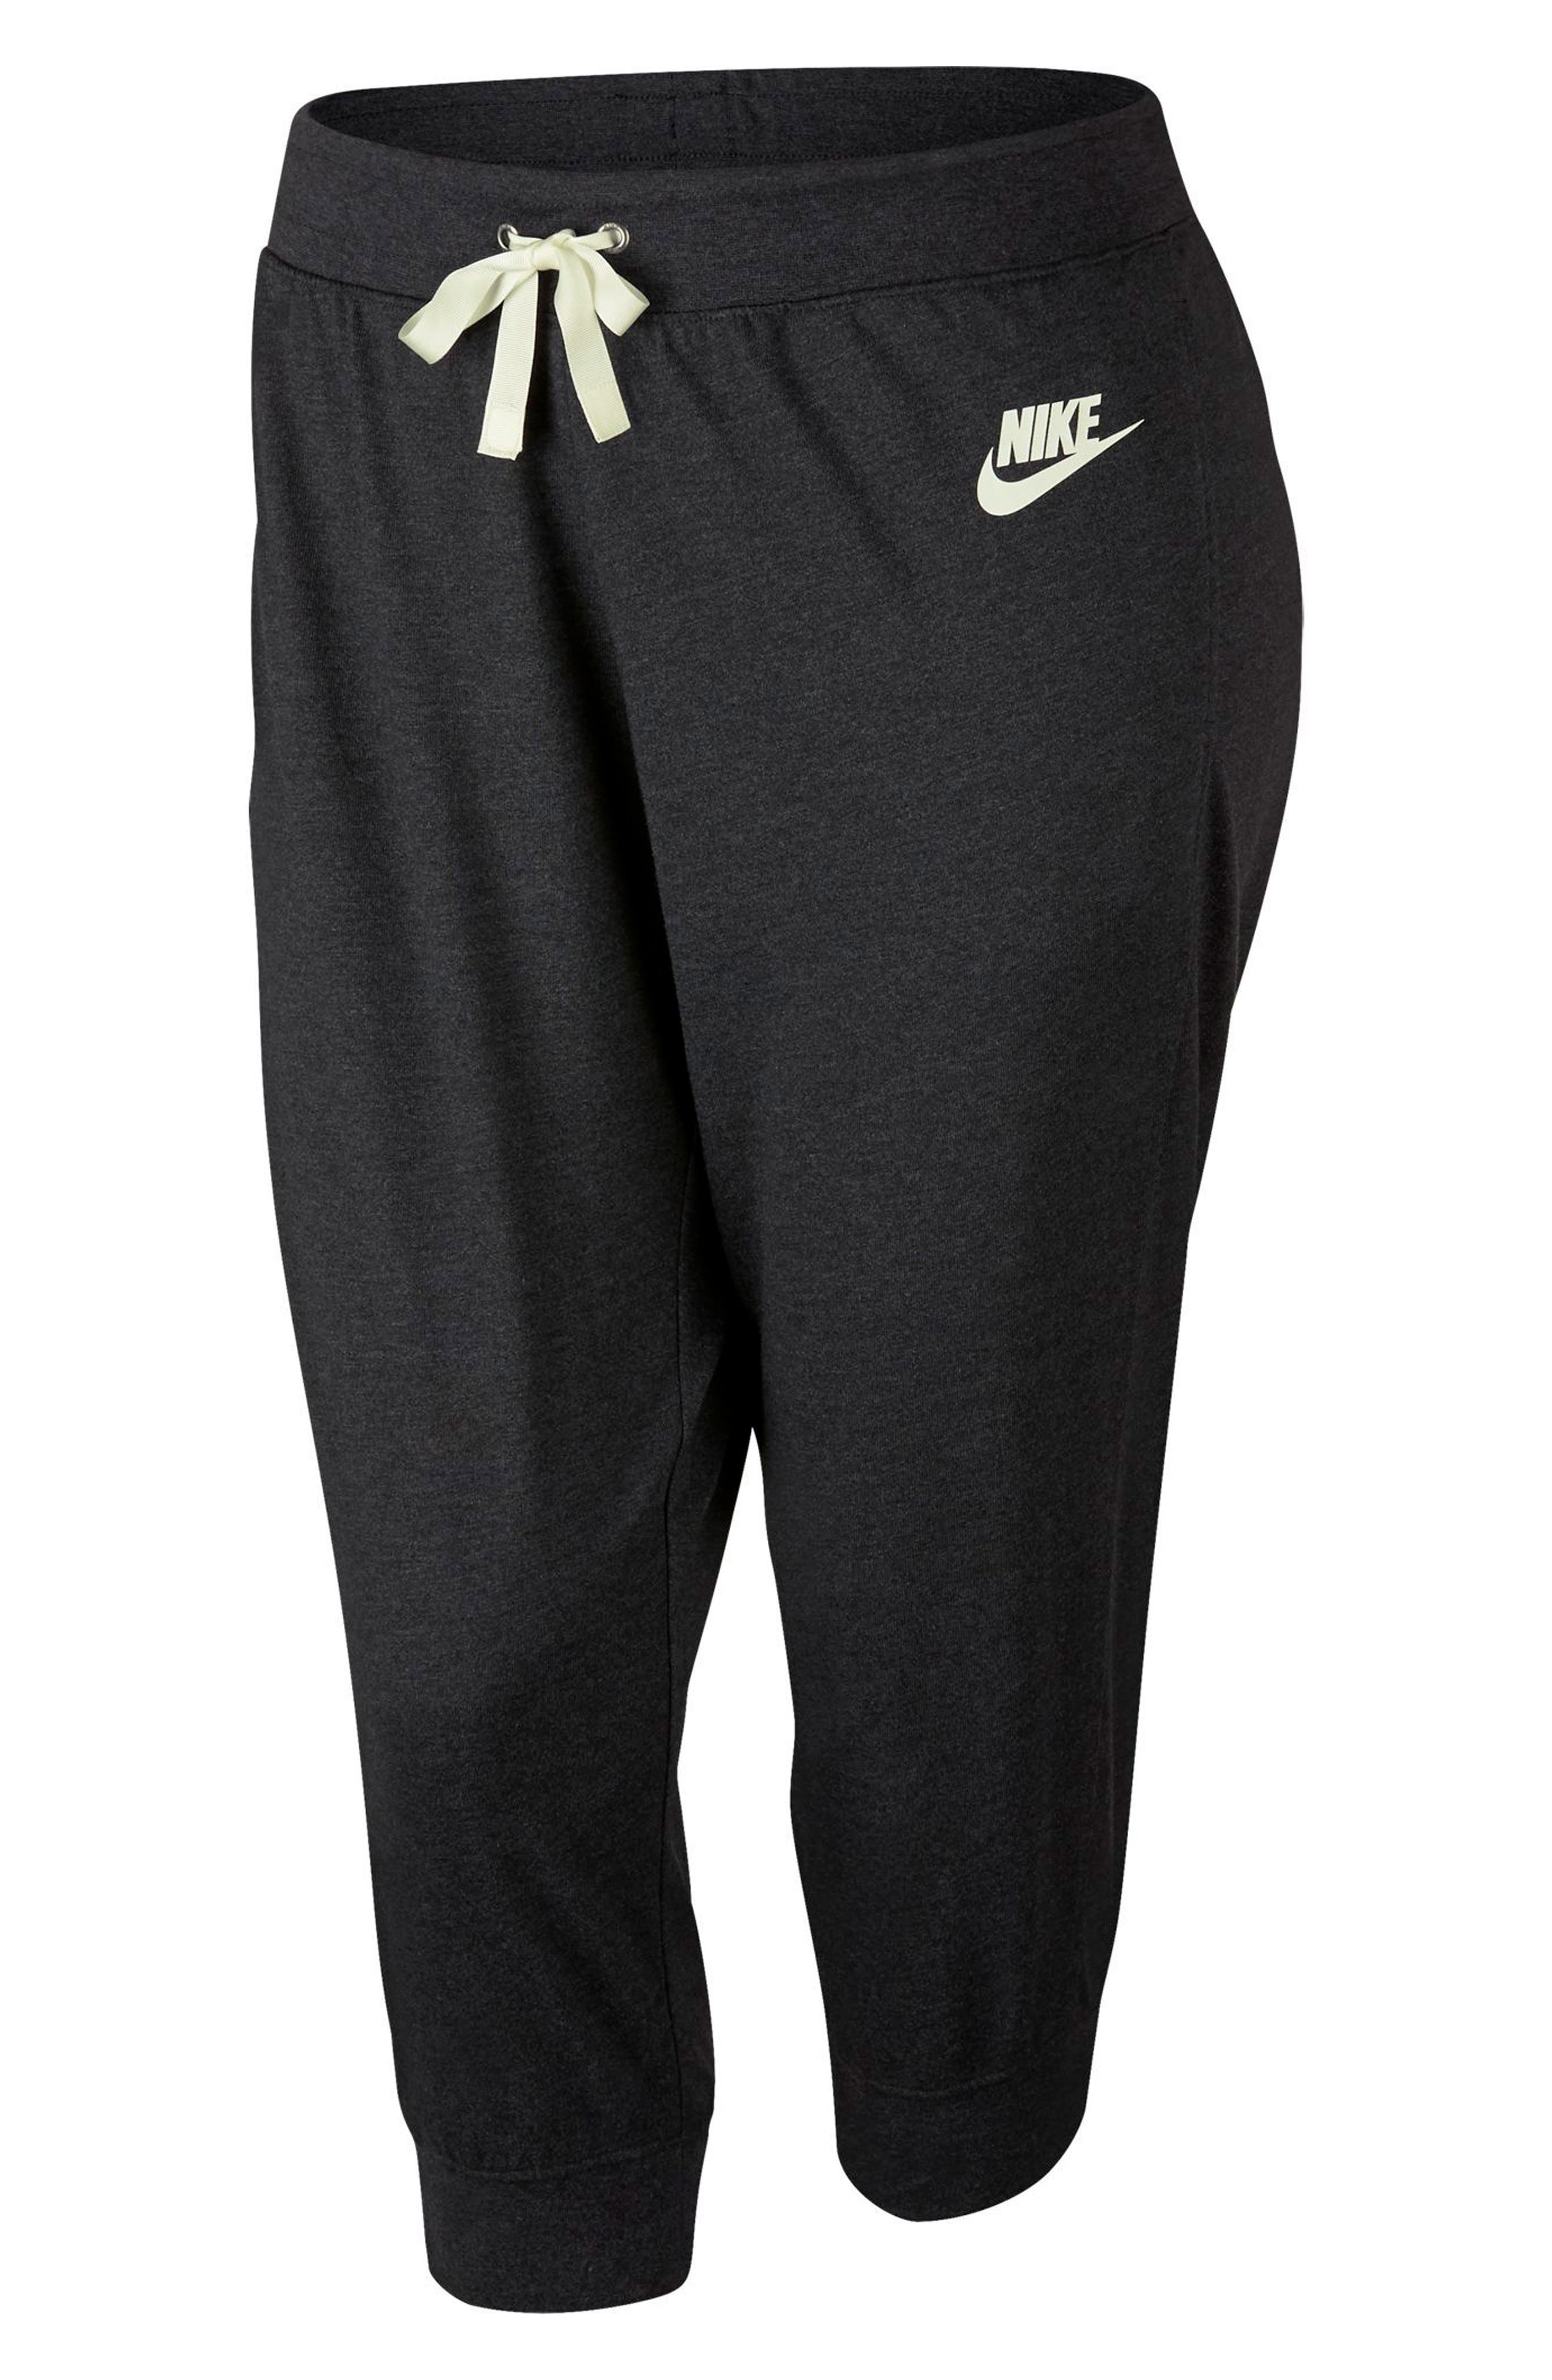 NIKE,                             Sportswear Gym Capris,                             Alternate thumbnail 6, color,                             001